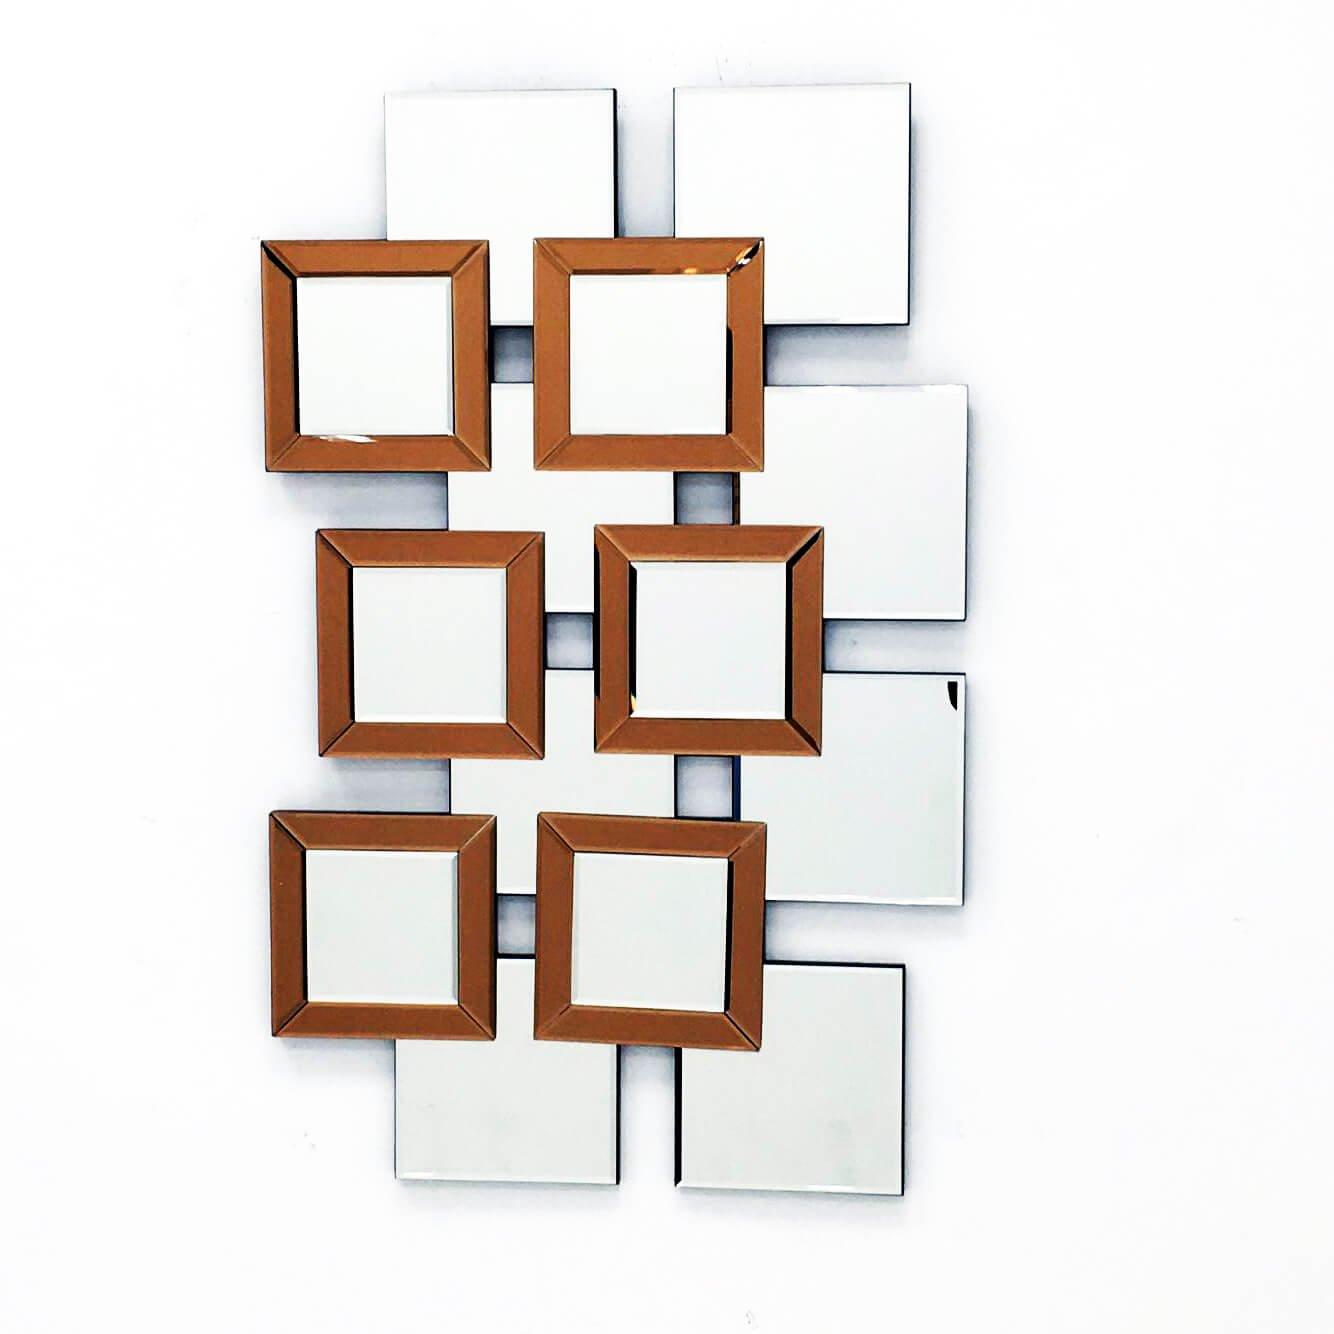 Fab Glass and Mirror FAB-WSTC002 Decorative Sunburst, Bathroom Wall Mirrors, 14 X 37.5 by Fab Glass and Mirror